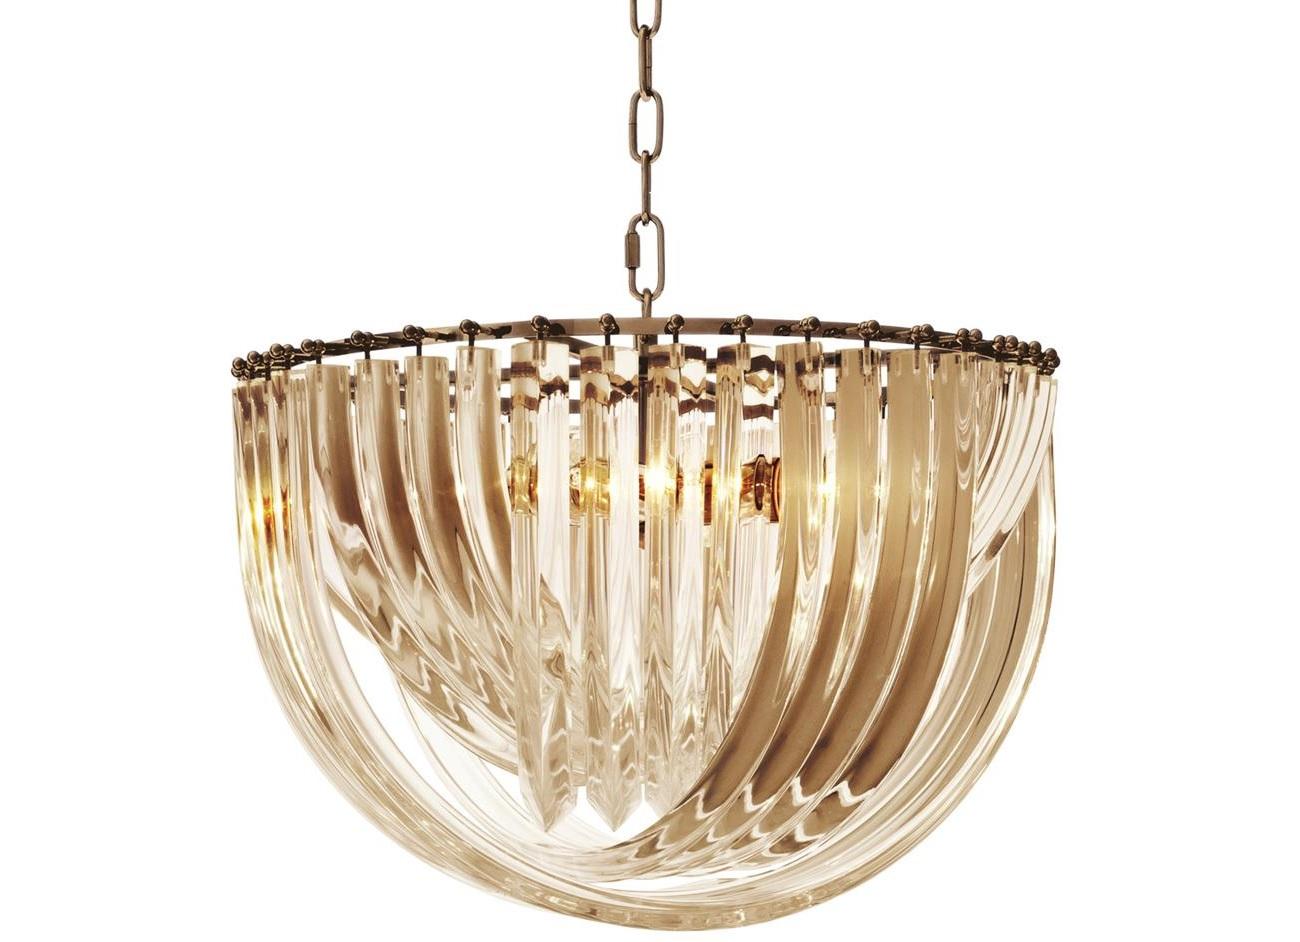 Подвесной светильник MuranoПодвесные светильники<br>Вид цоколя: E27Мощность: 40WКоличество ламп: 4 (нет в комплекте)<br><br>kit: None<br>gender: None